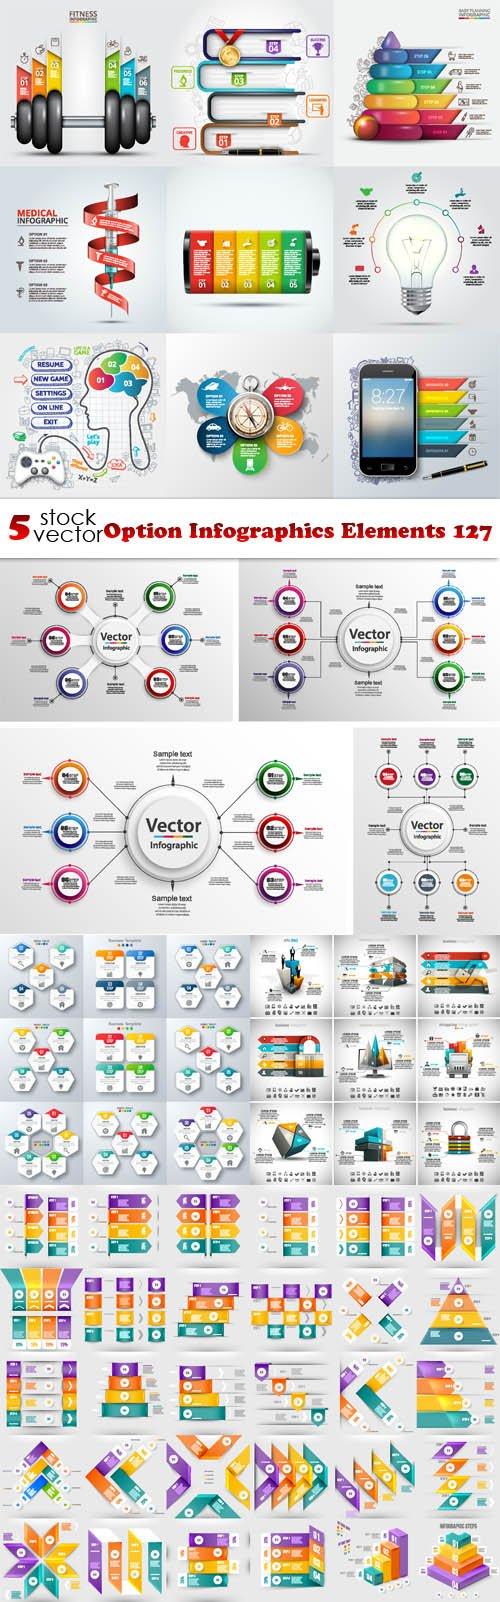 Vectors - Option Infographics Elements 127